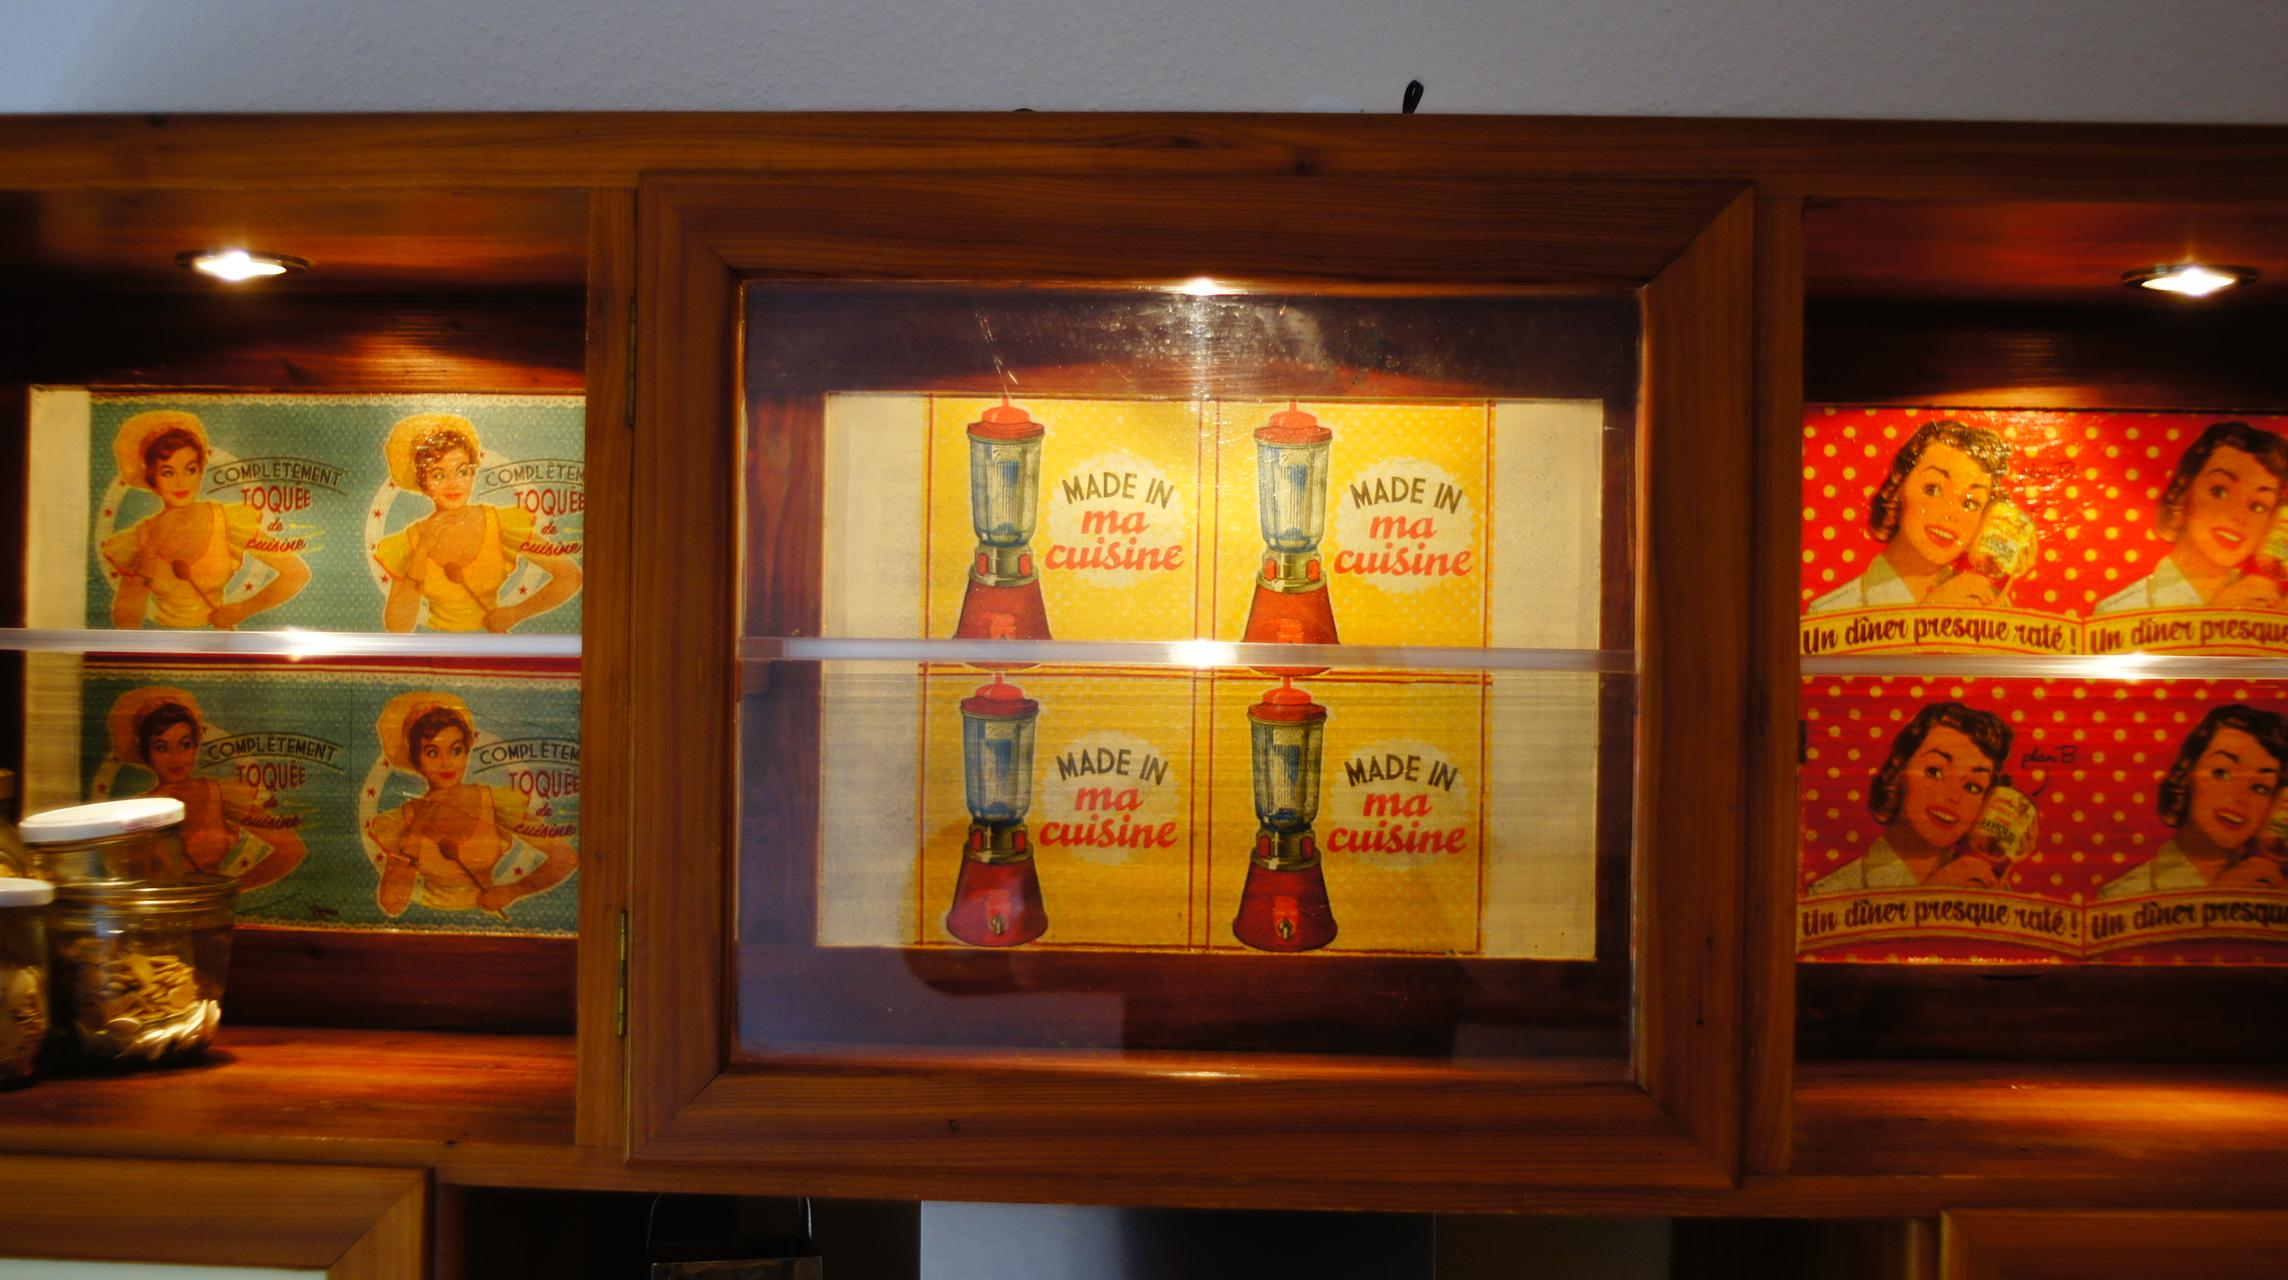 Smeg Kühlschrank Coca Cola : Retro kühlschrank u2022 bilder & ideen u2022 couch